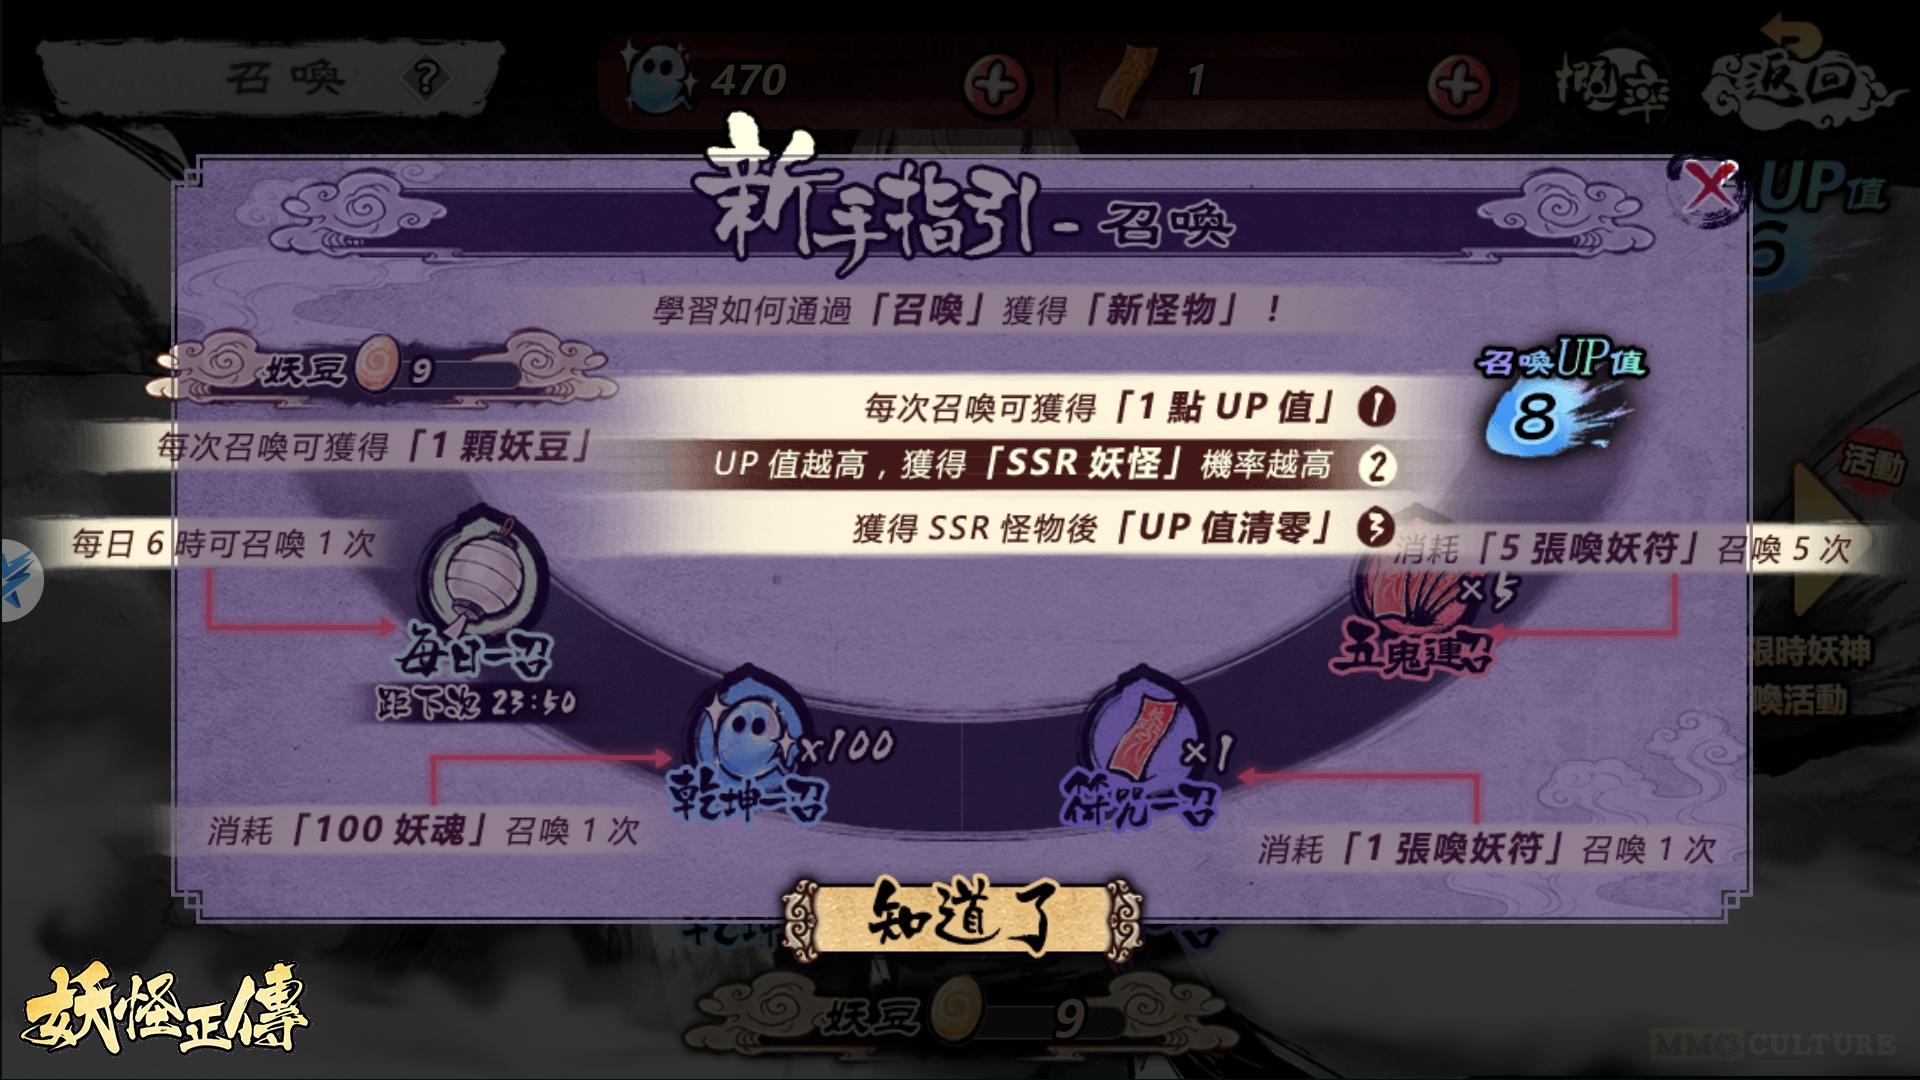 Yokai Spirits Hunt Taiwan server UP points system